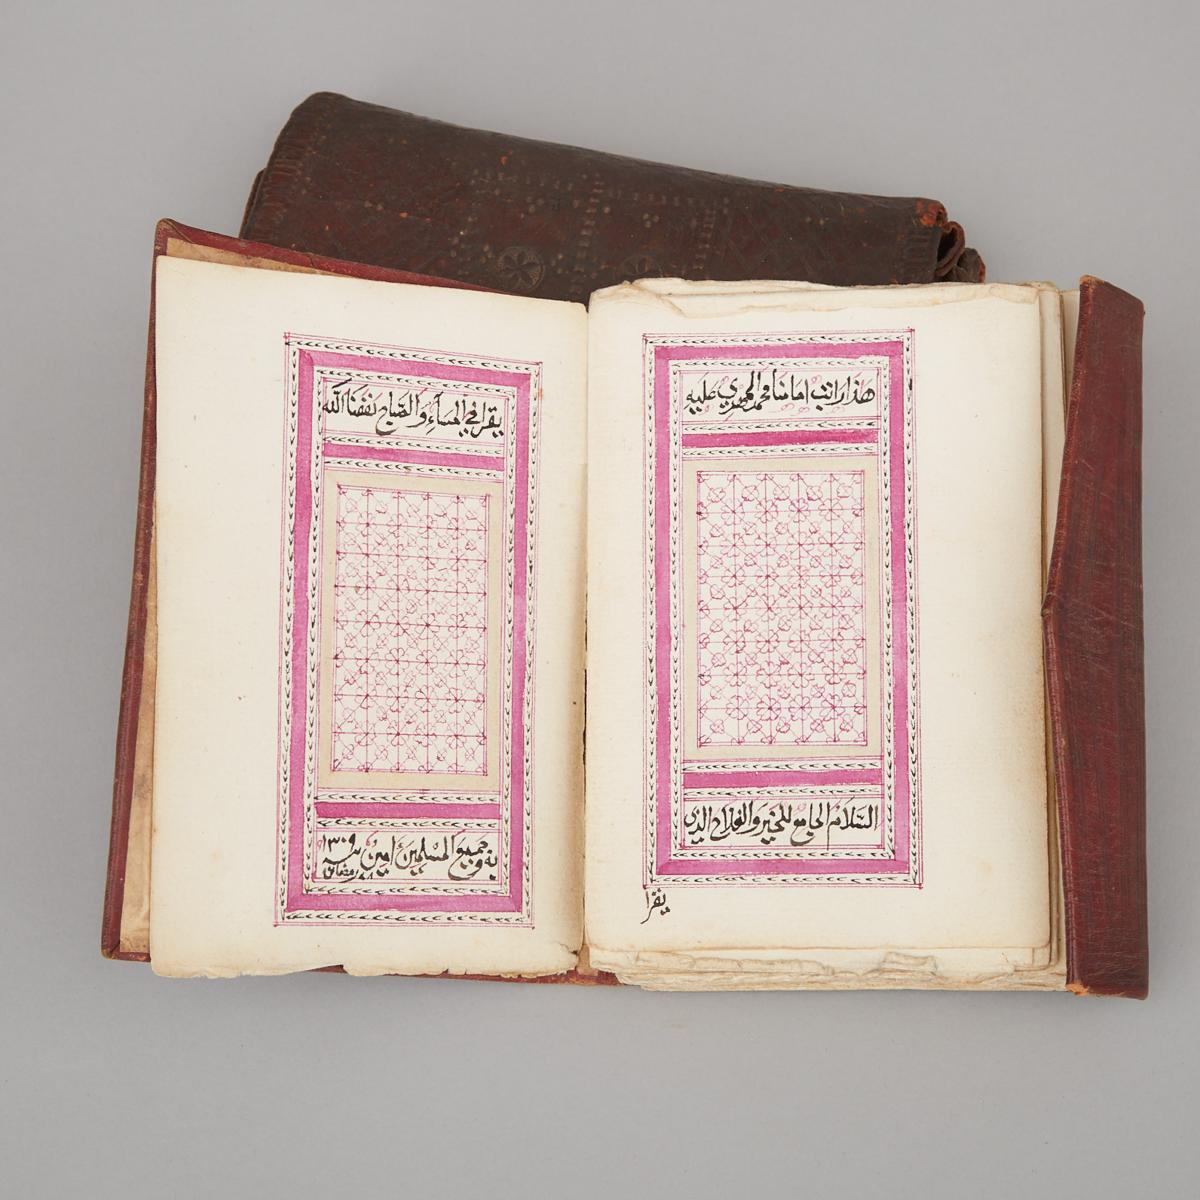 Islamic Prayer Manuscript, 19th century, 7 x 5.5 in — 17.8 x 14 cm - Image 6 of 6